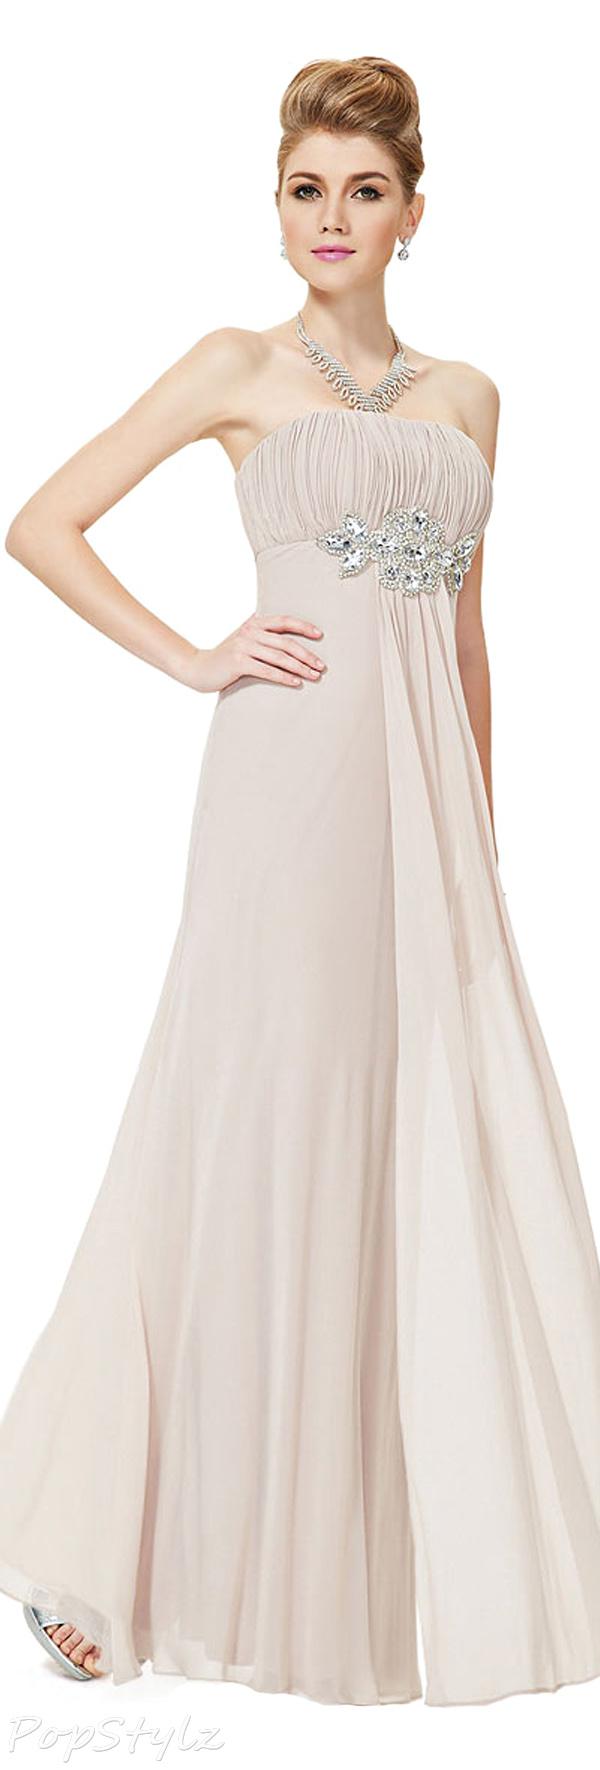 Ever Pretty 09652 Chiffon Dress